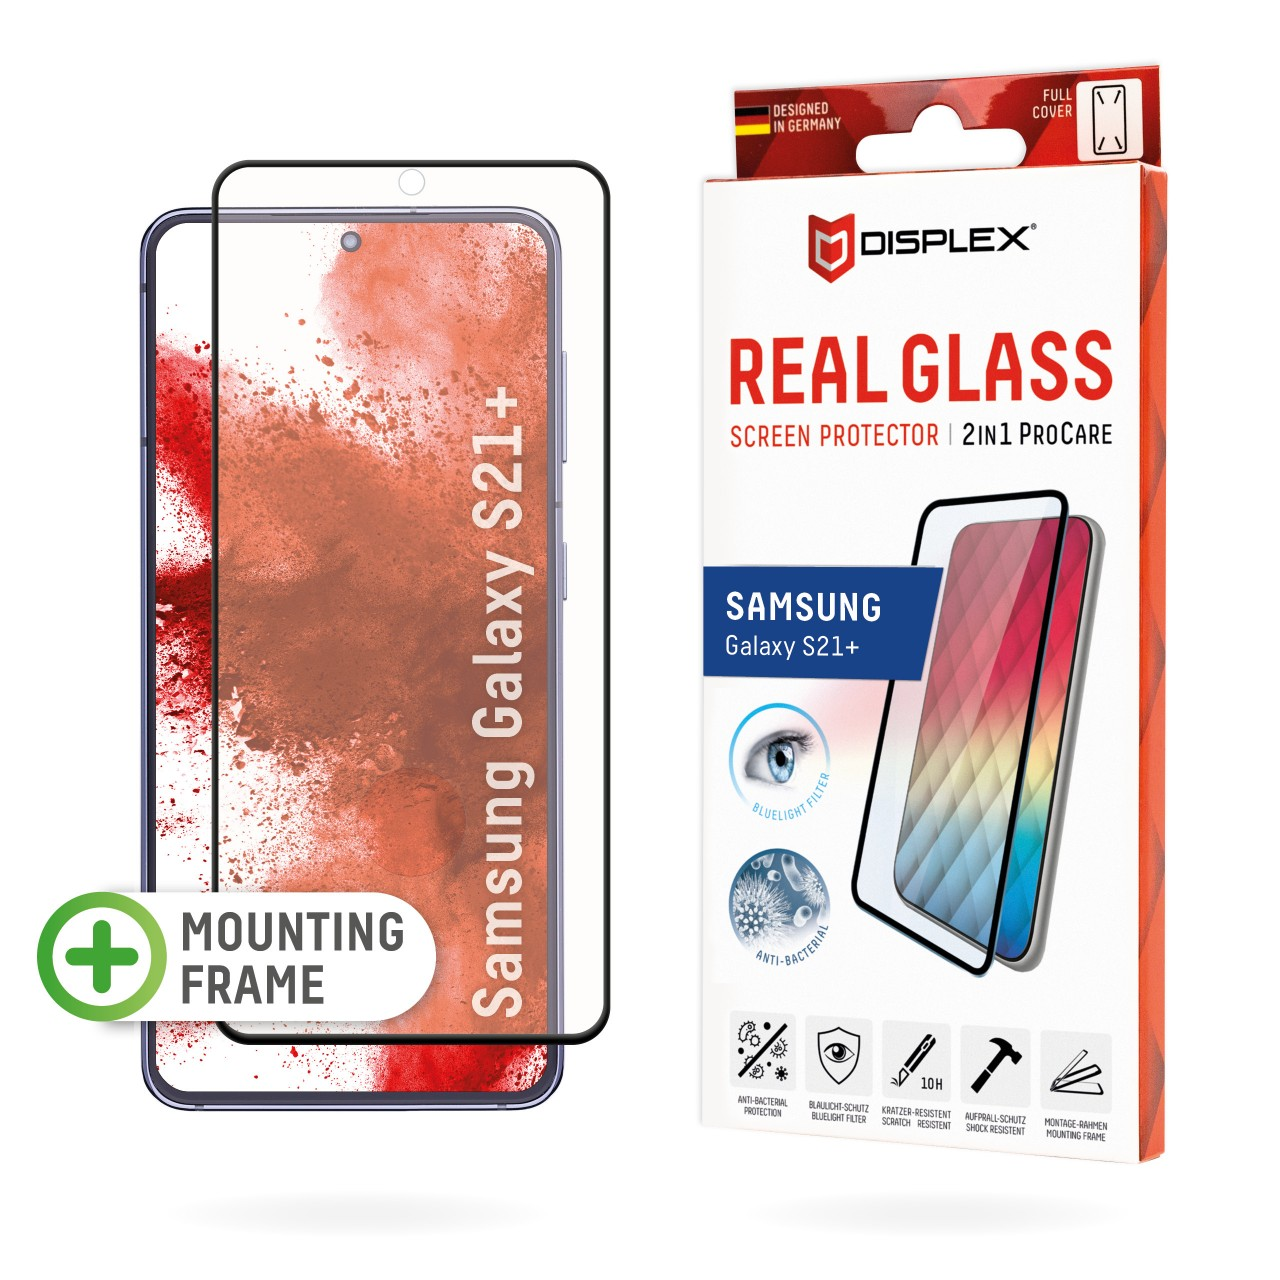 01419-SAMSUNG-Galaxy-S21-ProCareGlass-FC-3D-ENunDh2VE5VLs0V